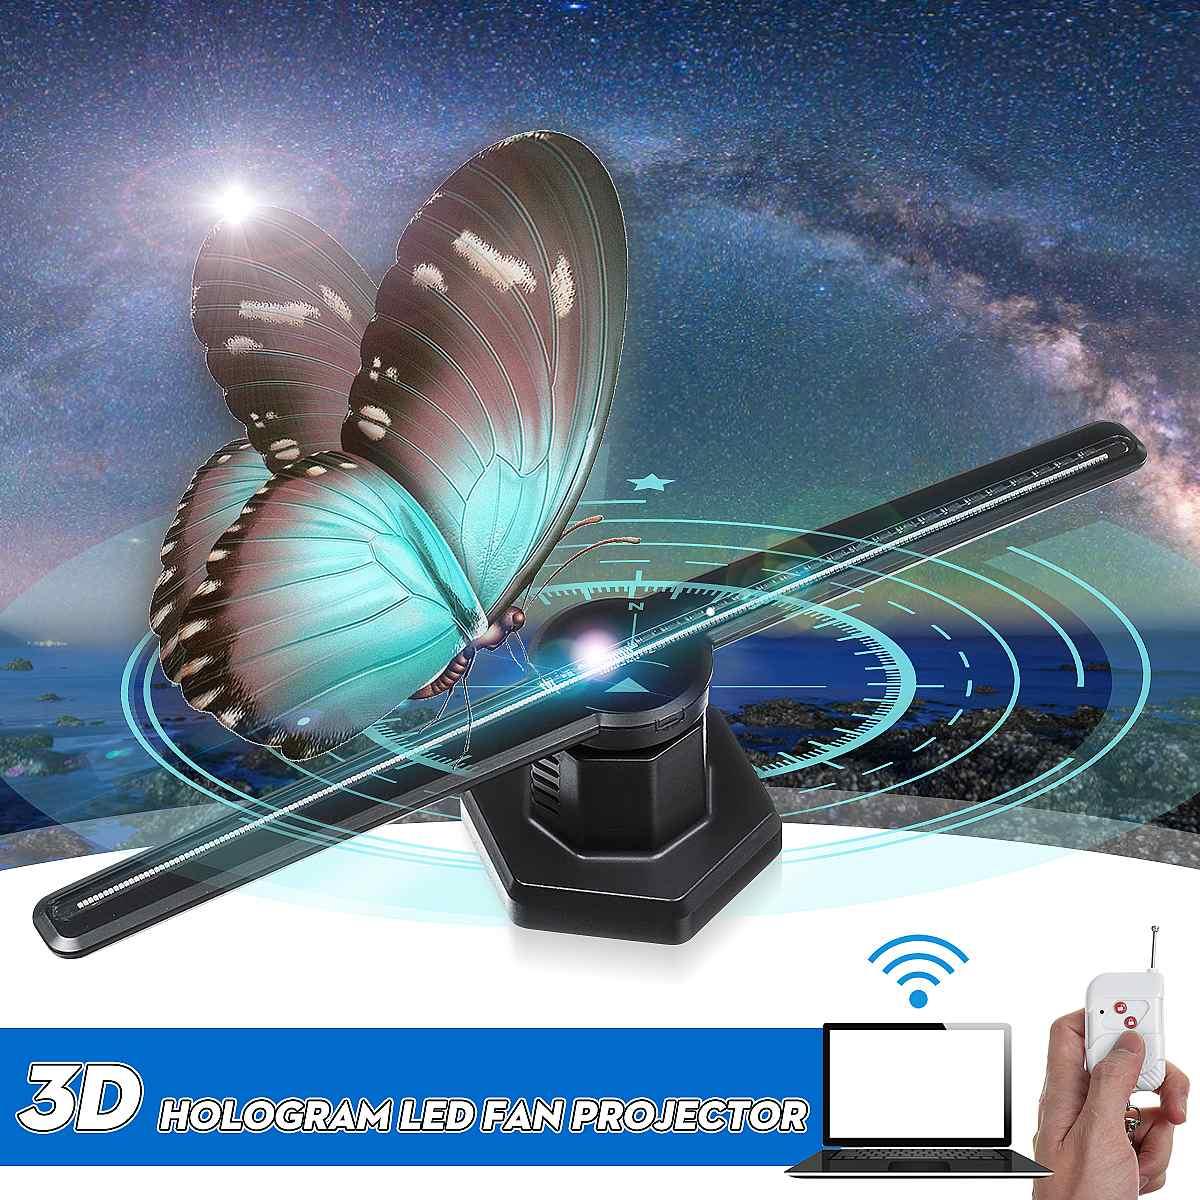 AC 100-240V 224LED Wifi 3D ホログラフィックプロジェクターホログラムプレーヤー LED 表示画像化ランプファン広告ライトリモート制御